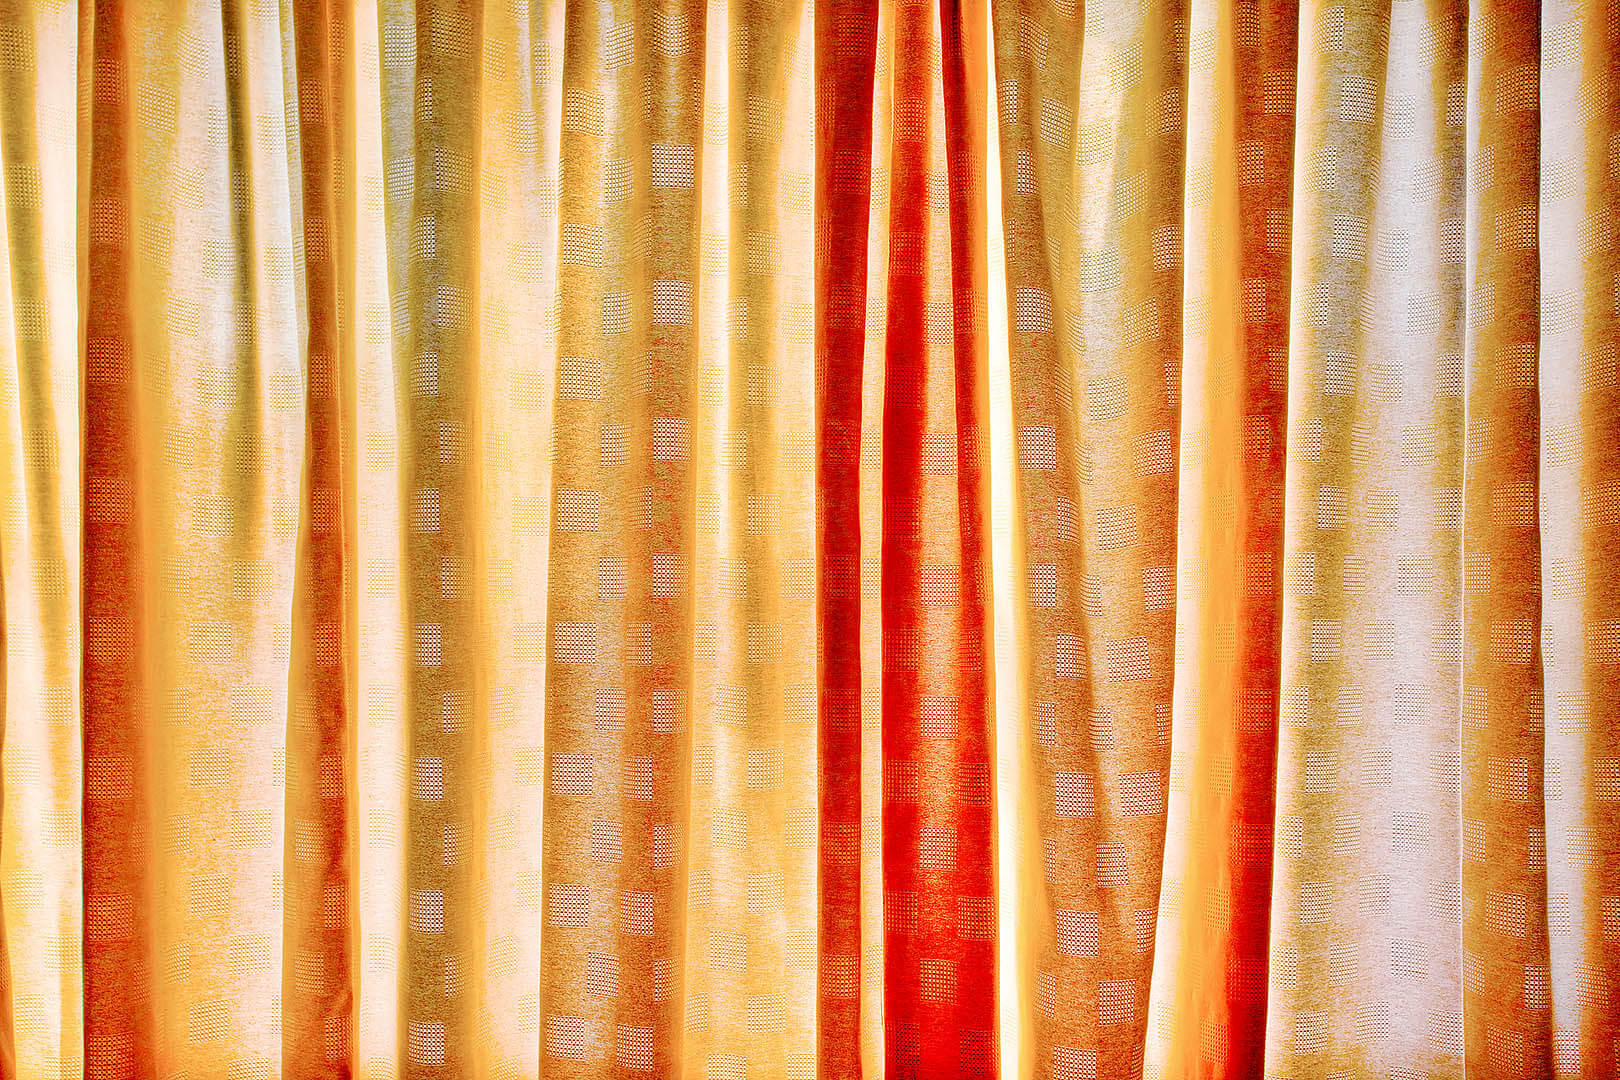 Curtains #2